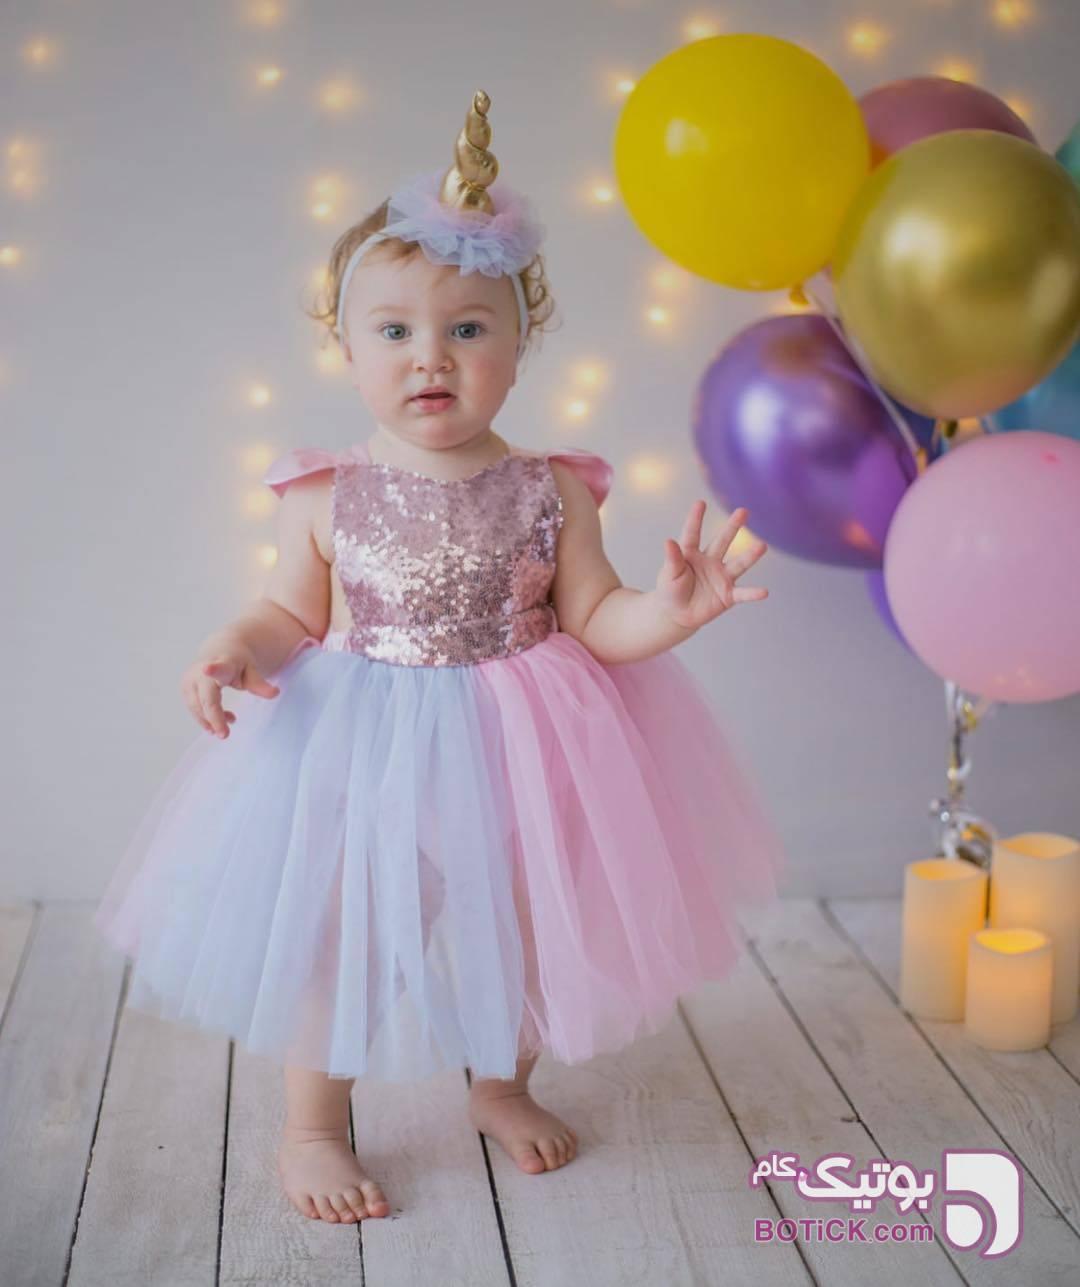 پيرهن صورتی لباس کودک دخترانه